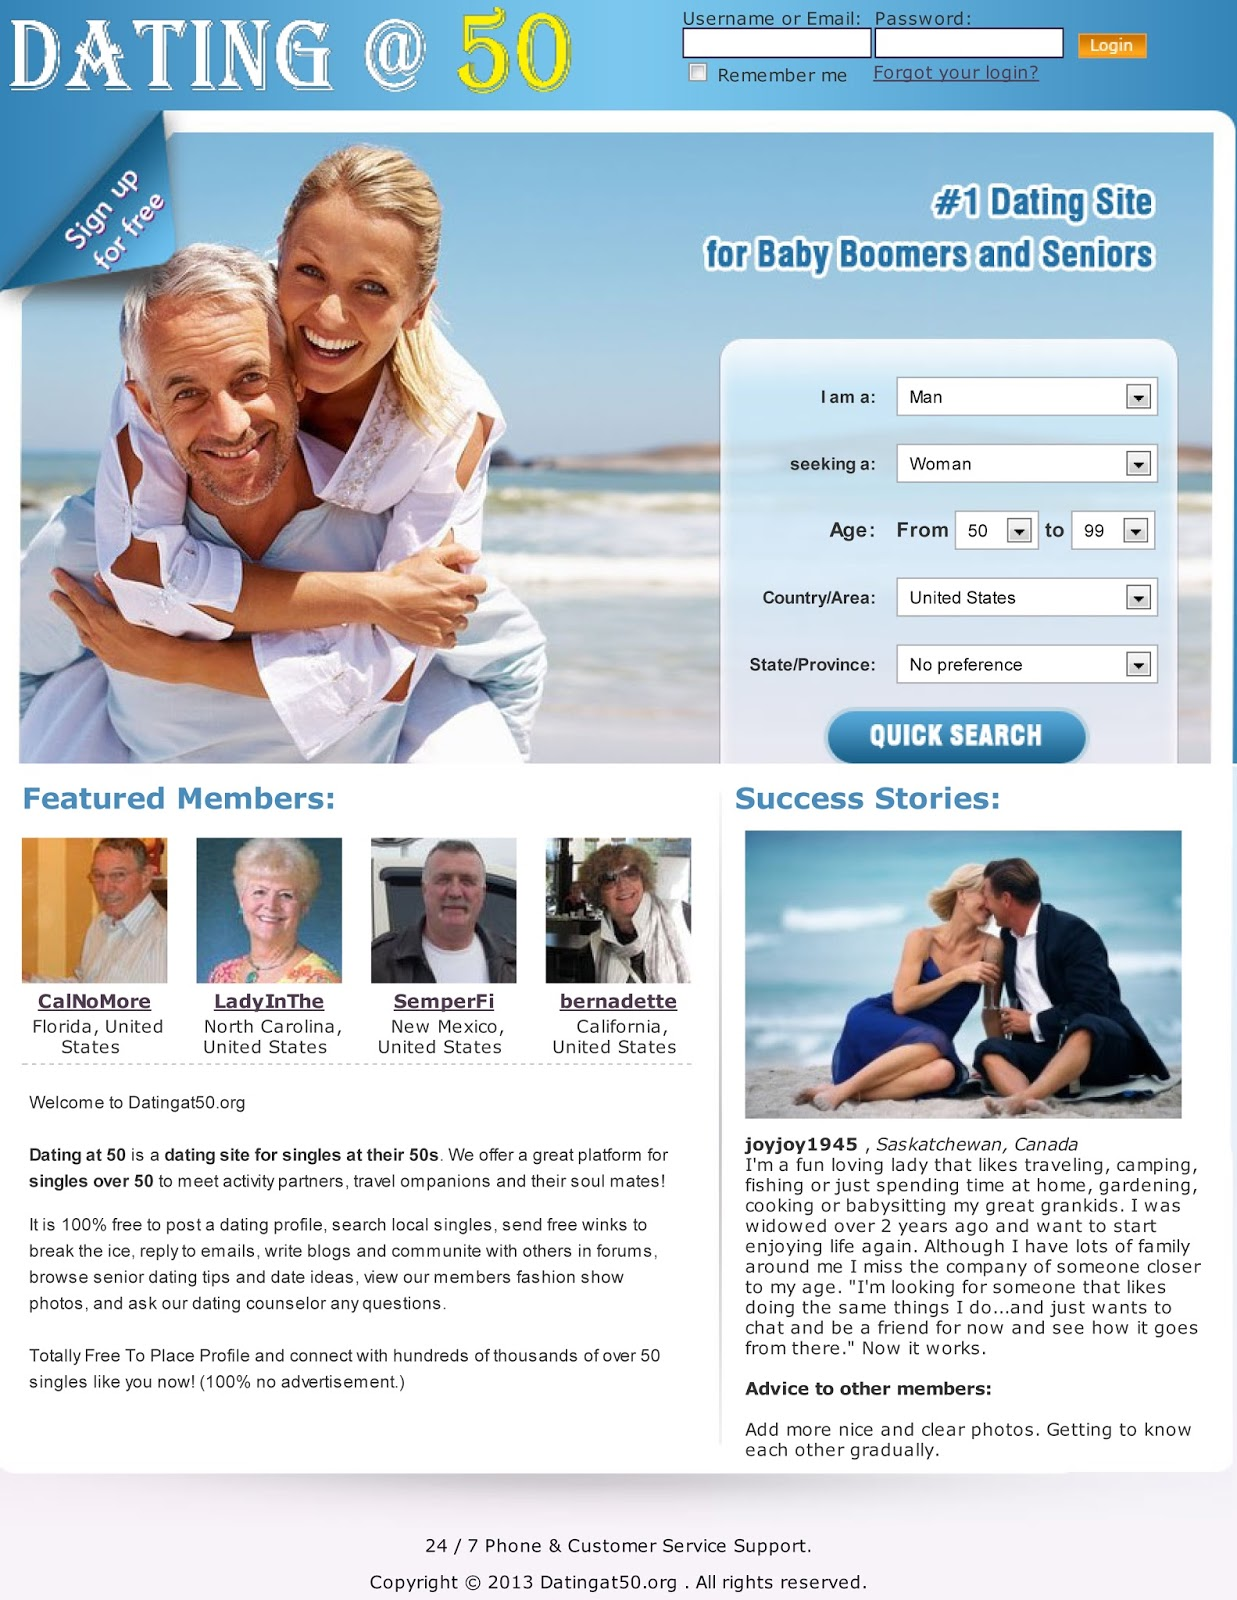 shaadi.com search